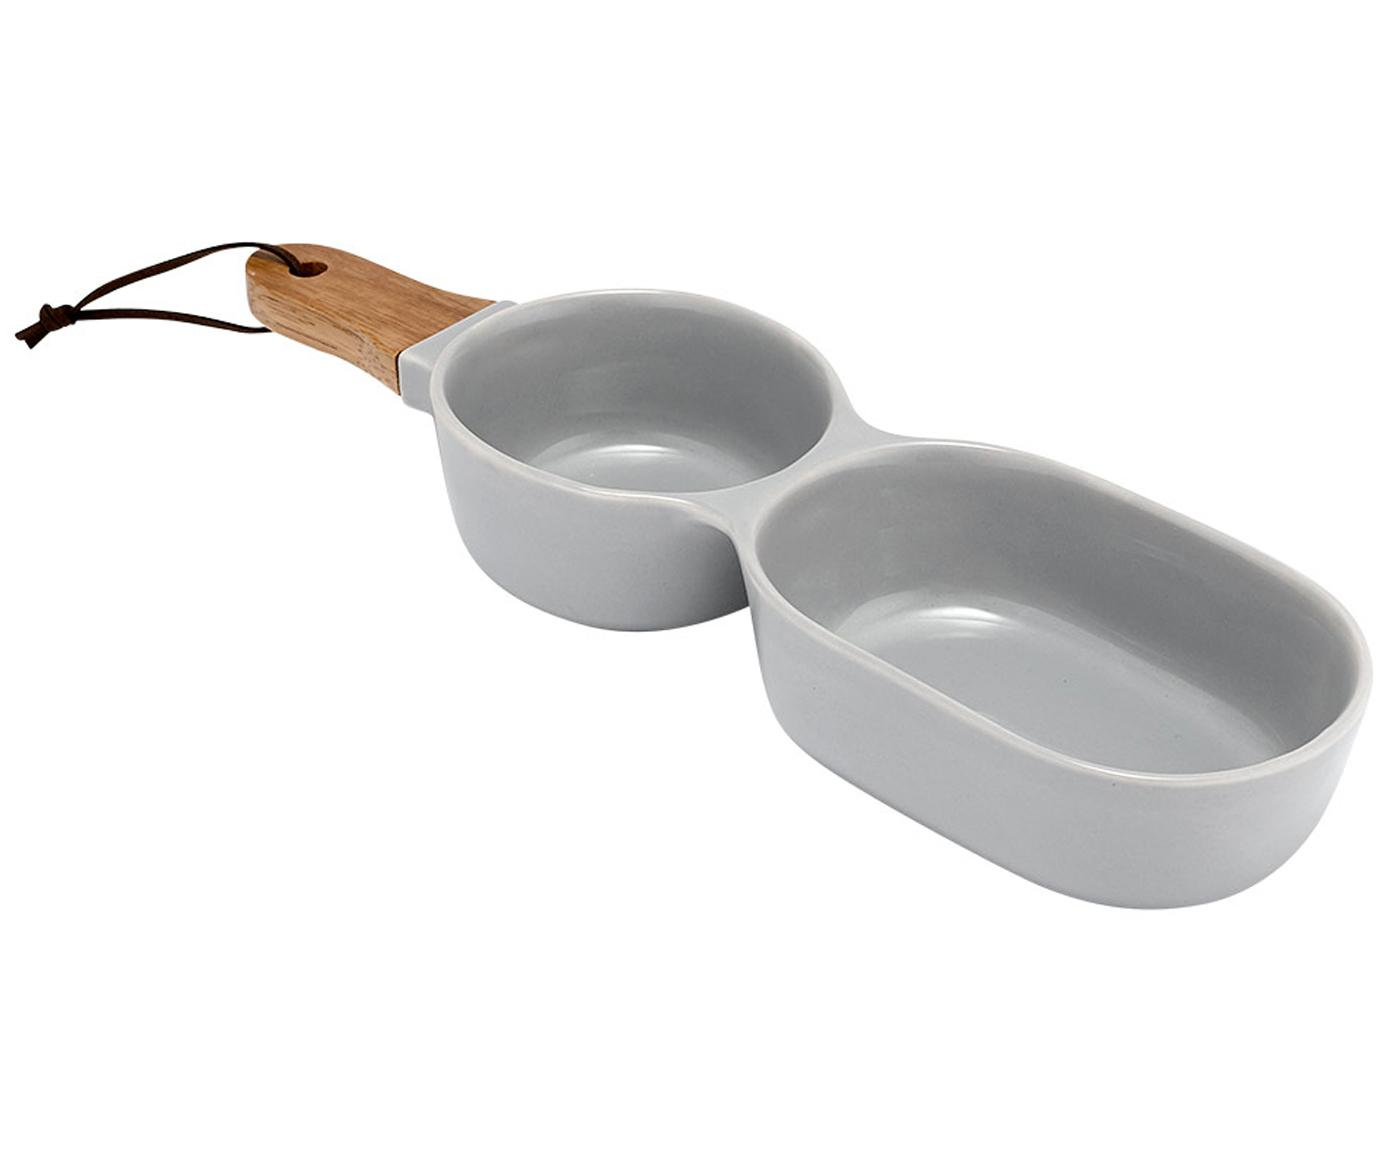 Servierschale Classic, Schale: Porzellan, Griff: Gummibaumholz, Grau, B 35 x T 10 cm